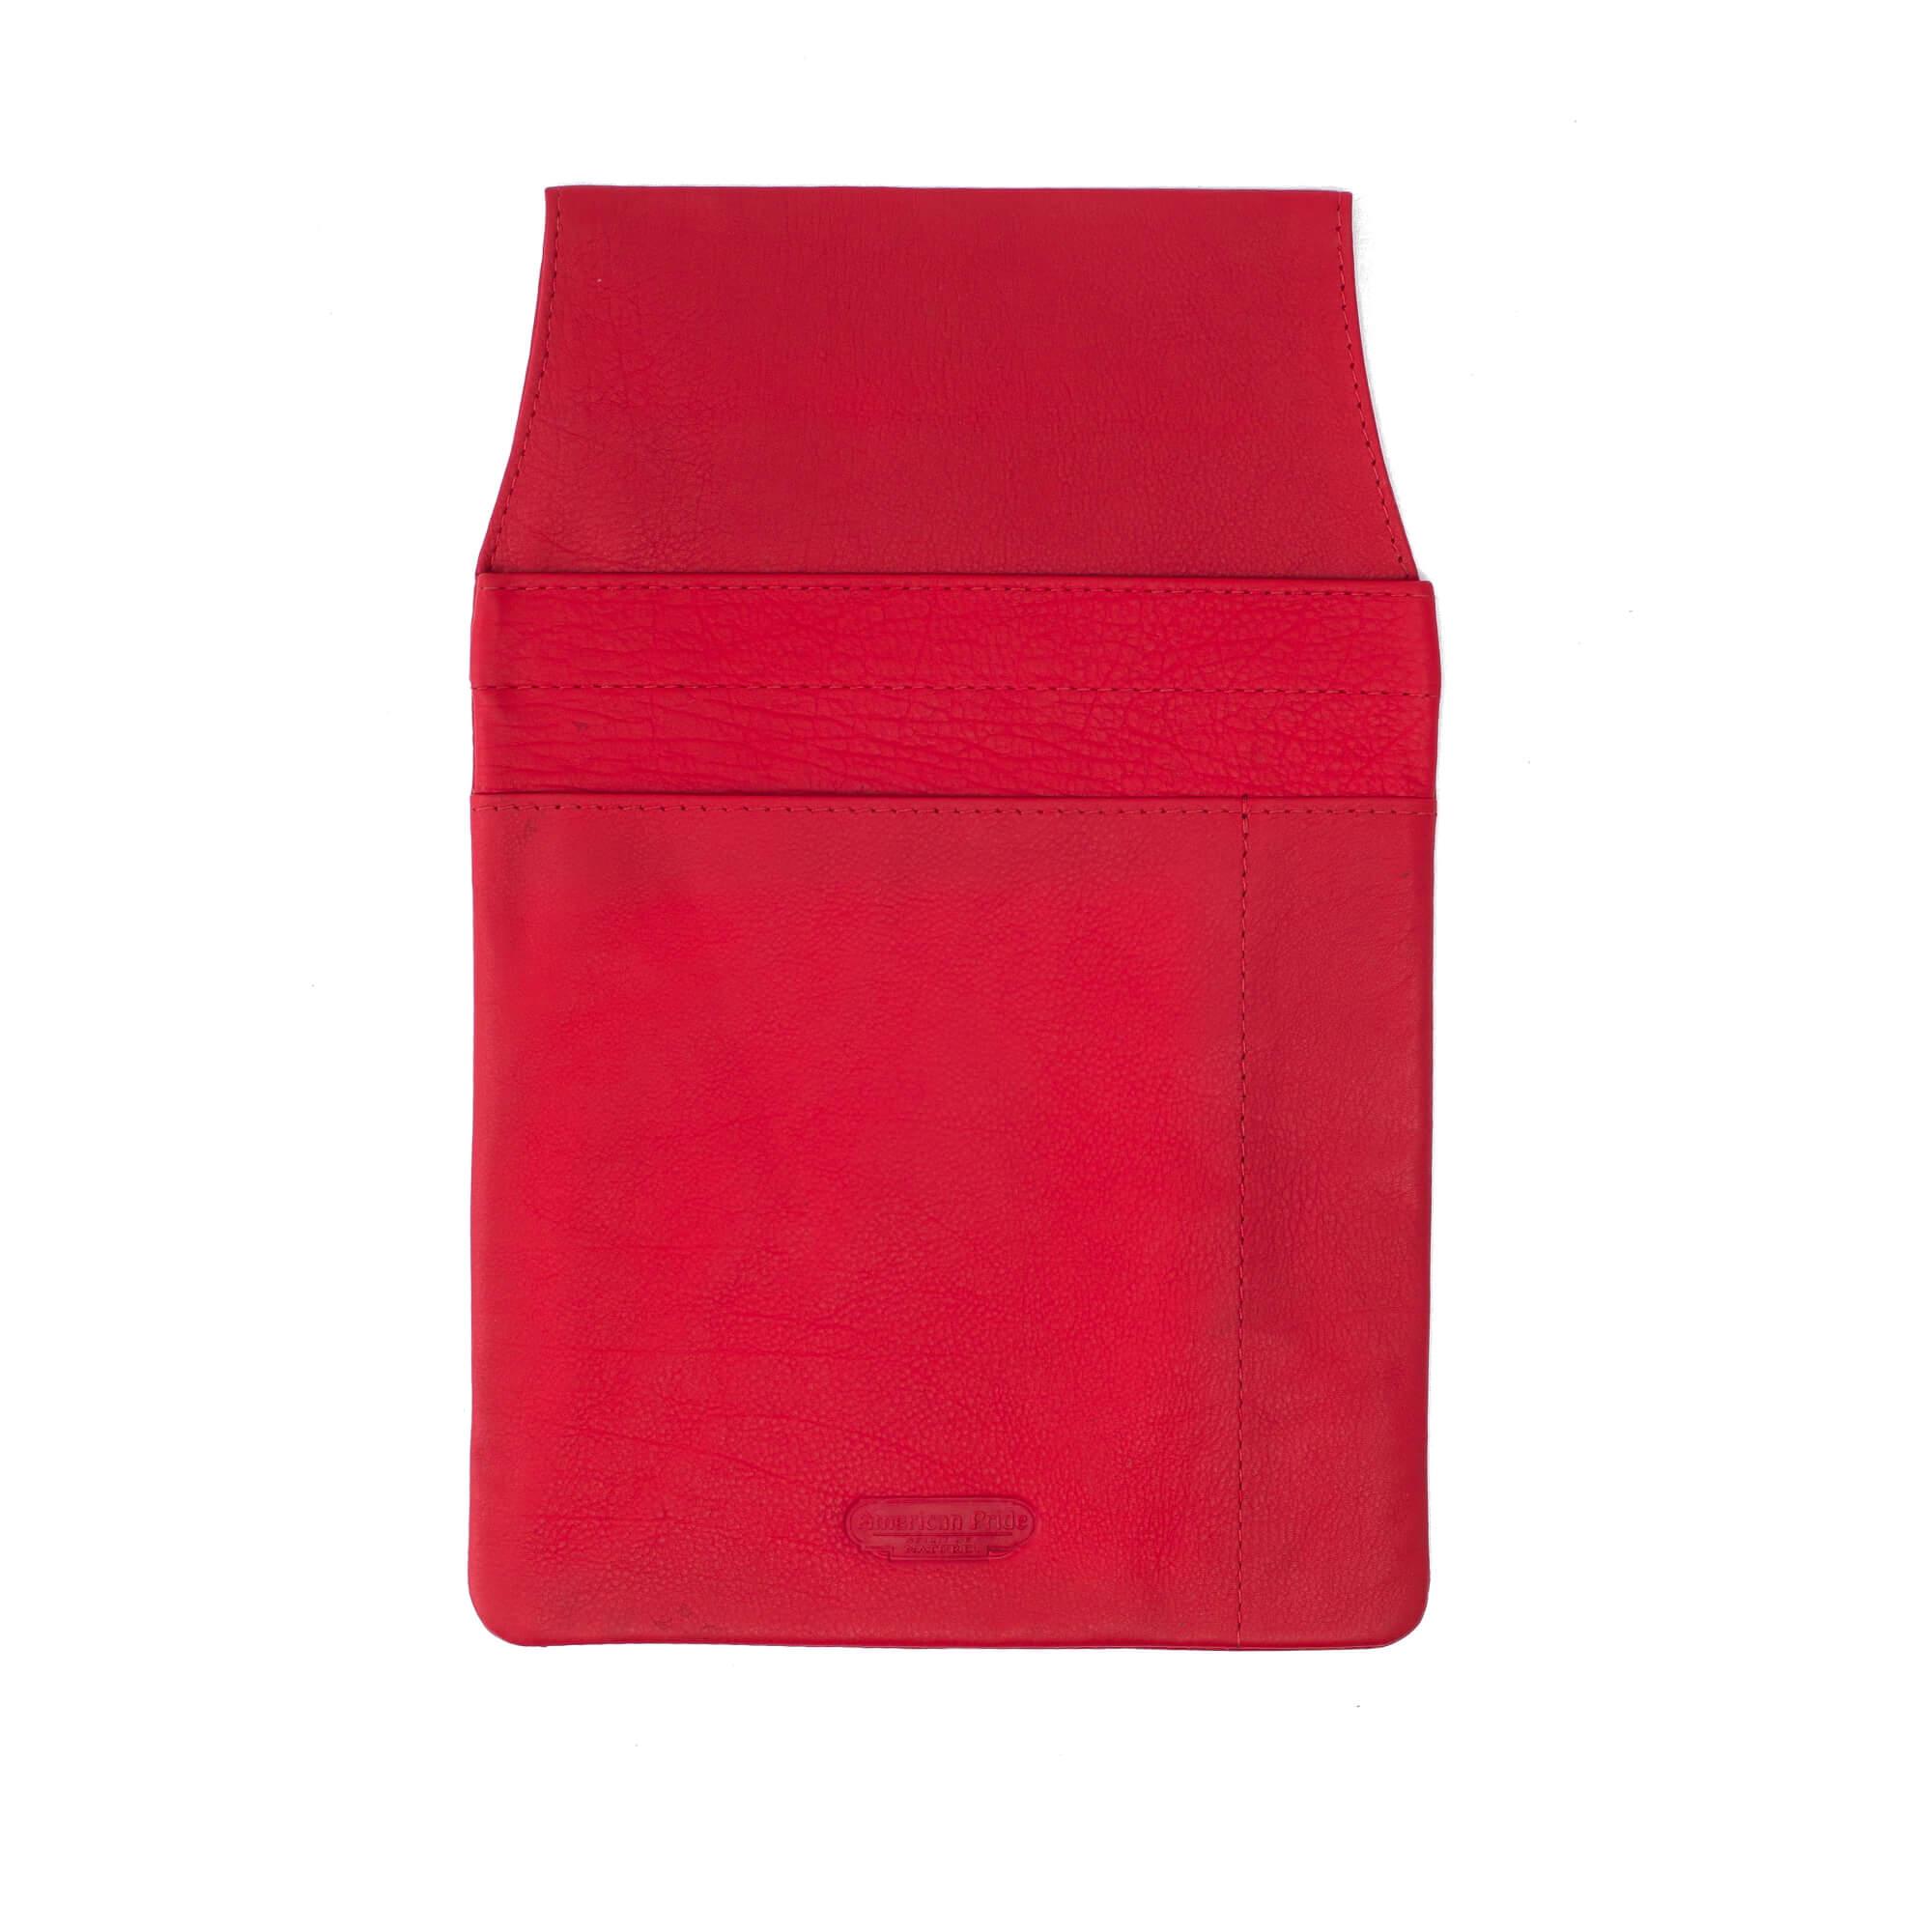 Piros bőr brifkótartó Ramsey 3